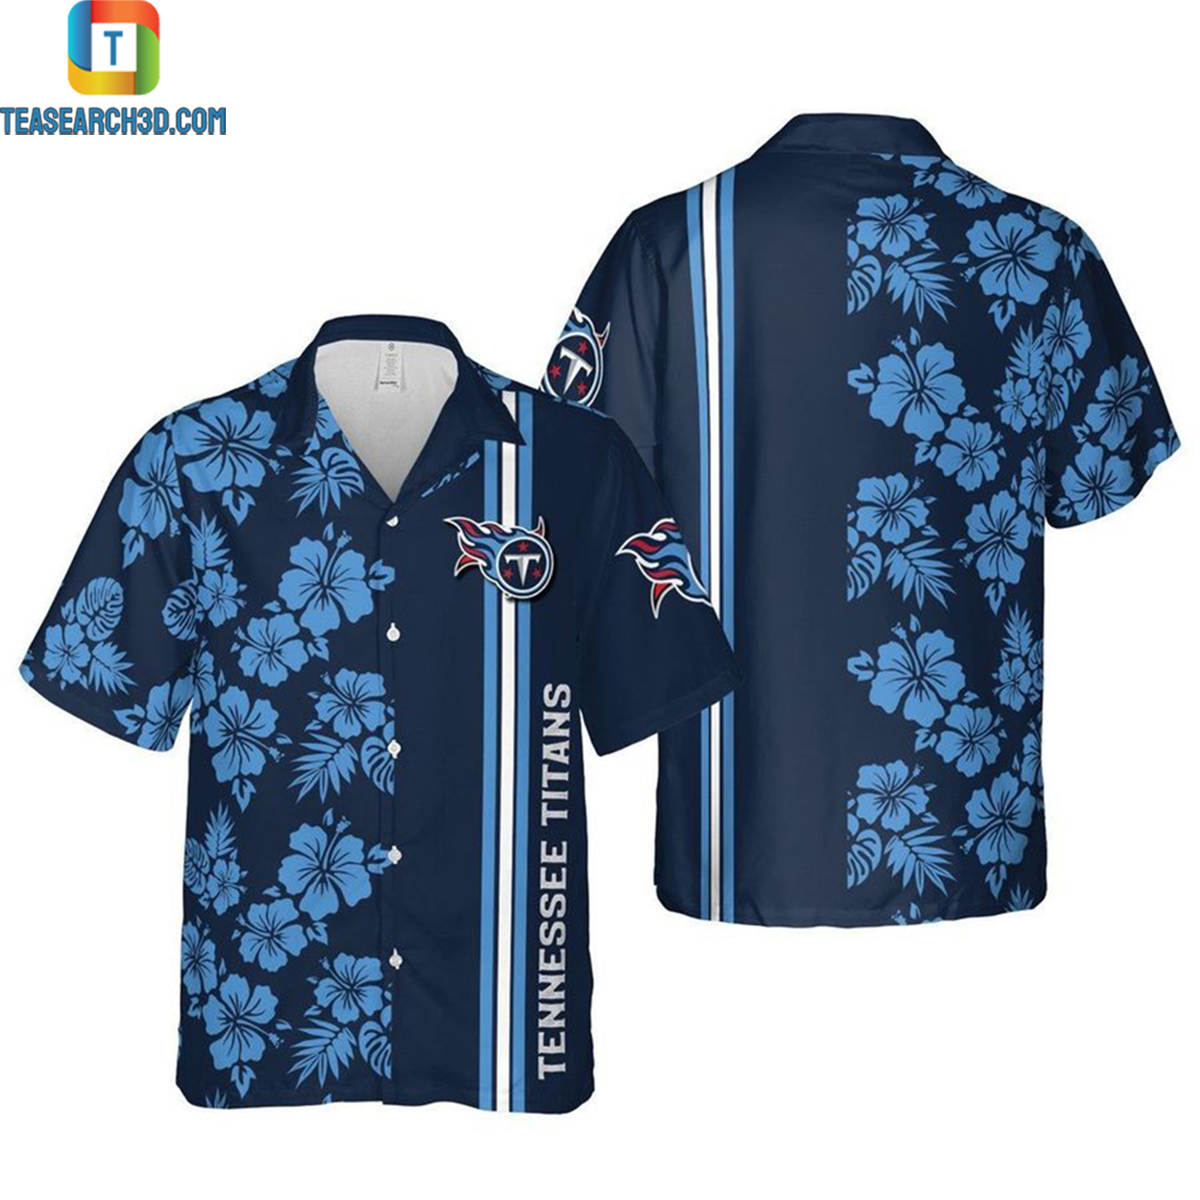 Tennessee titans nfl football nashville tennessee hawaiian shirt 2